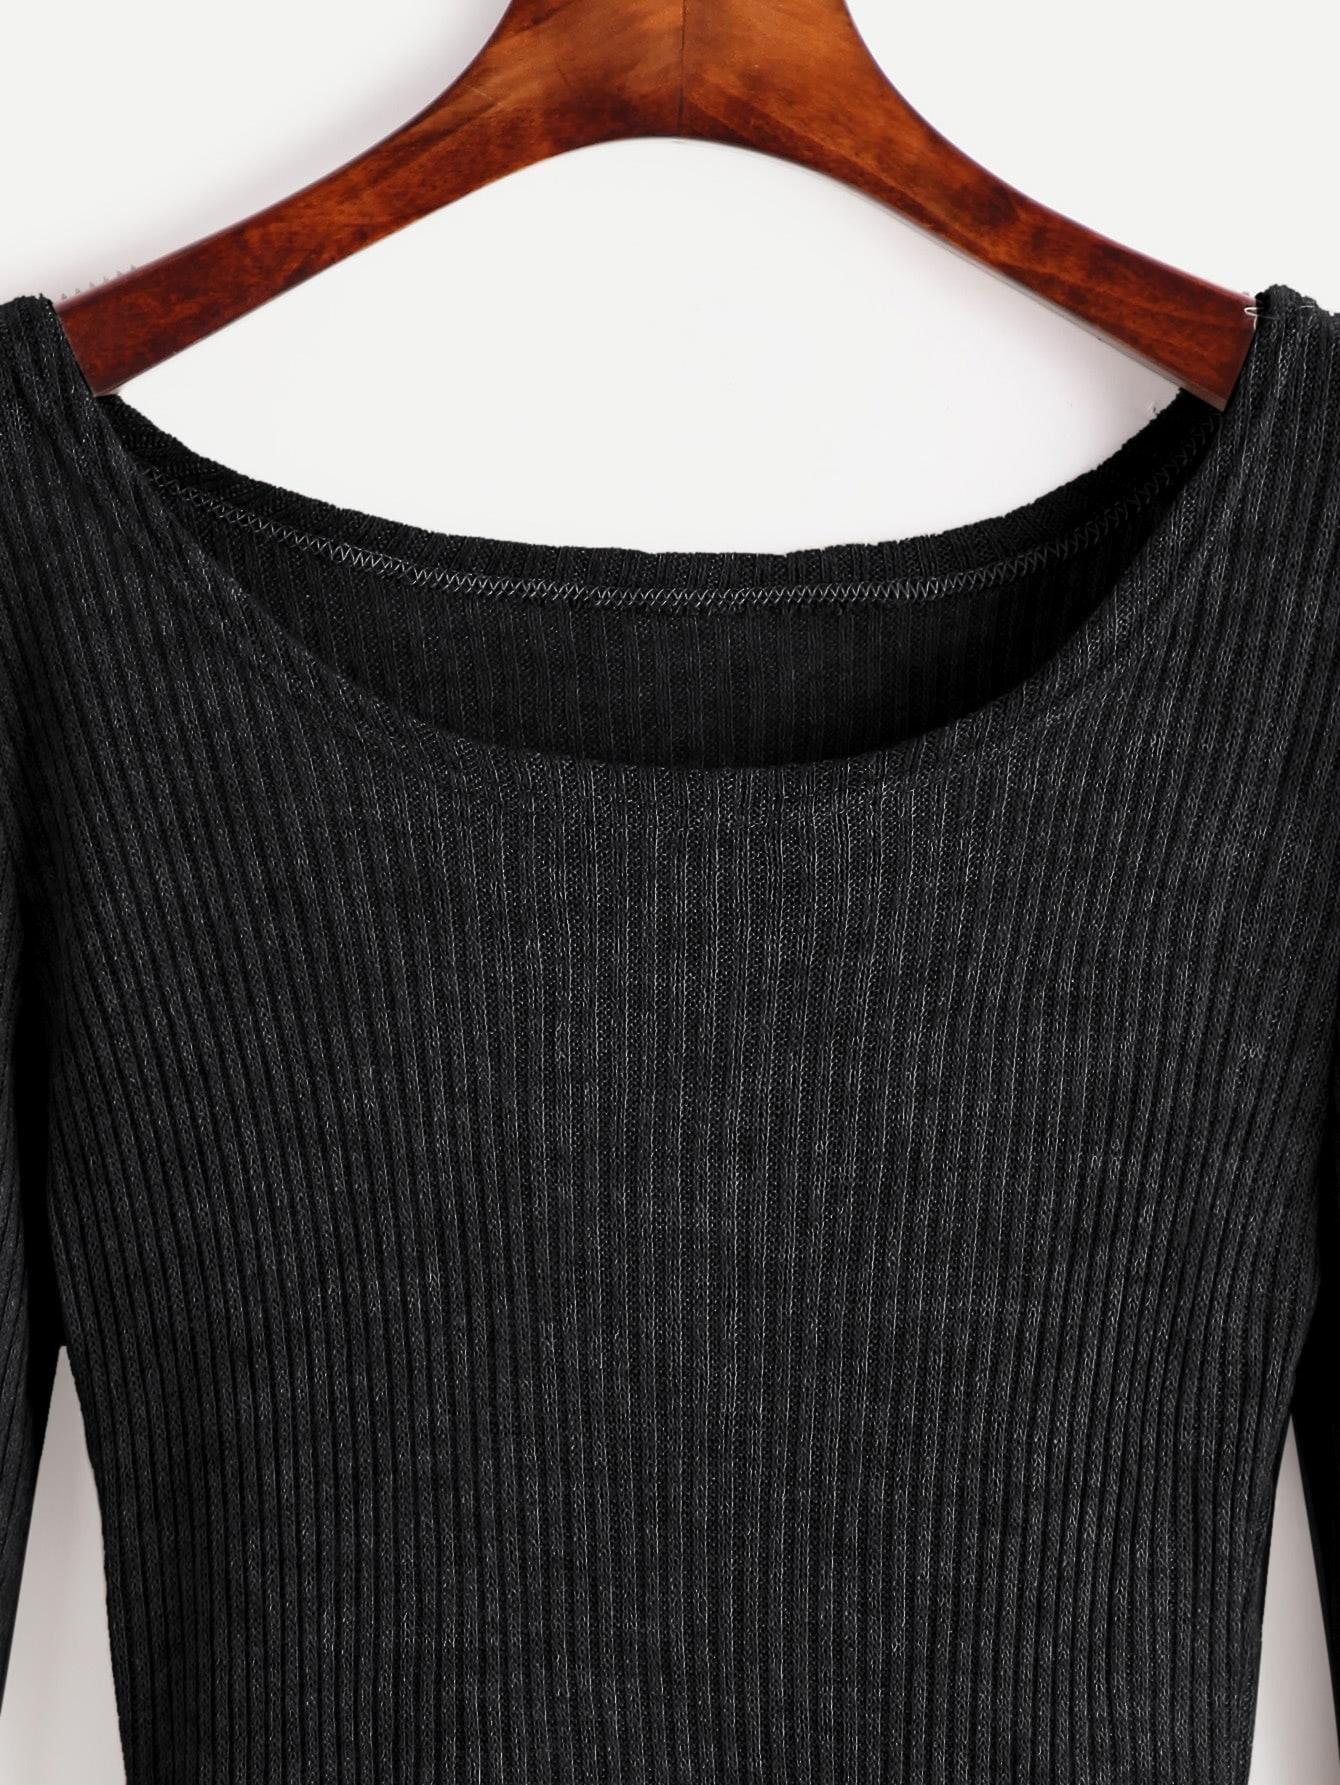 sweater161102105_2